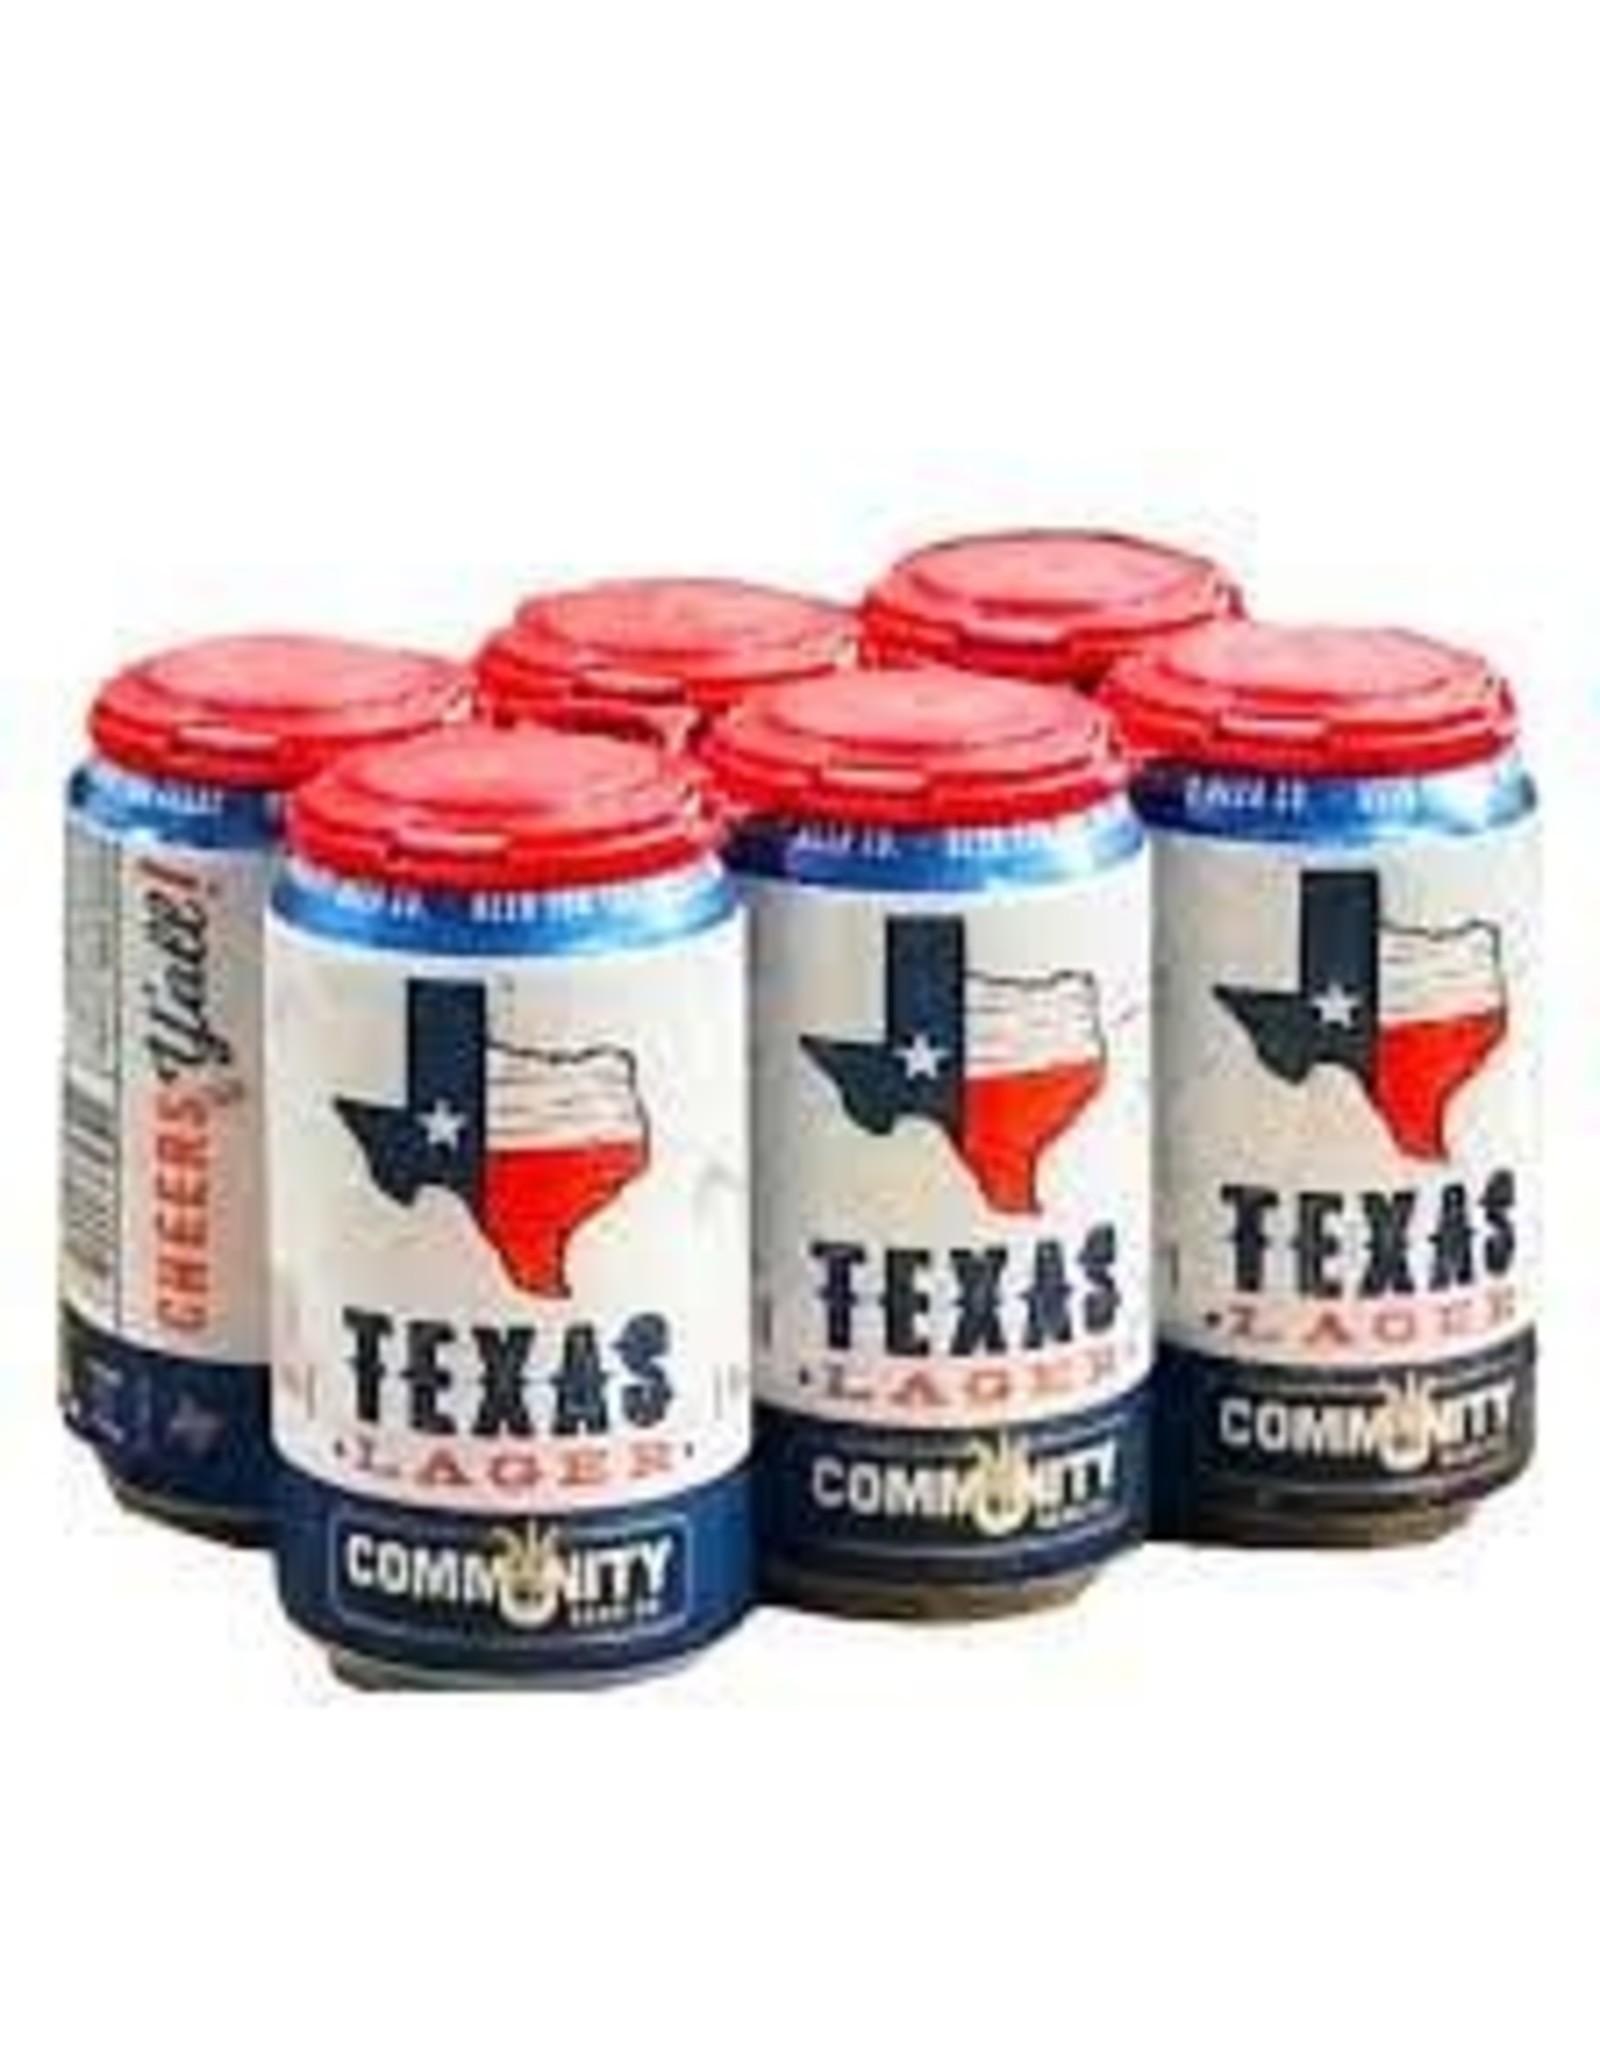 Community Texas helles 4-6-12ozCN